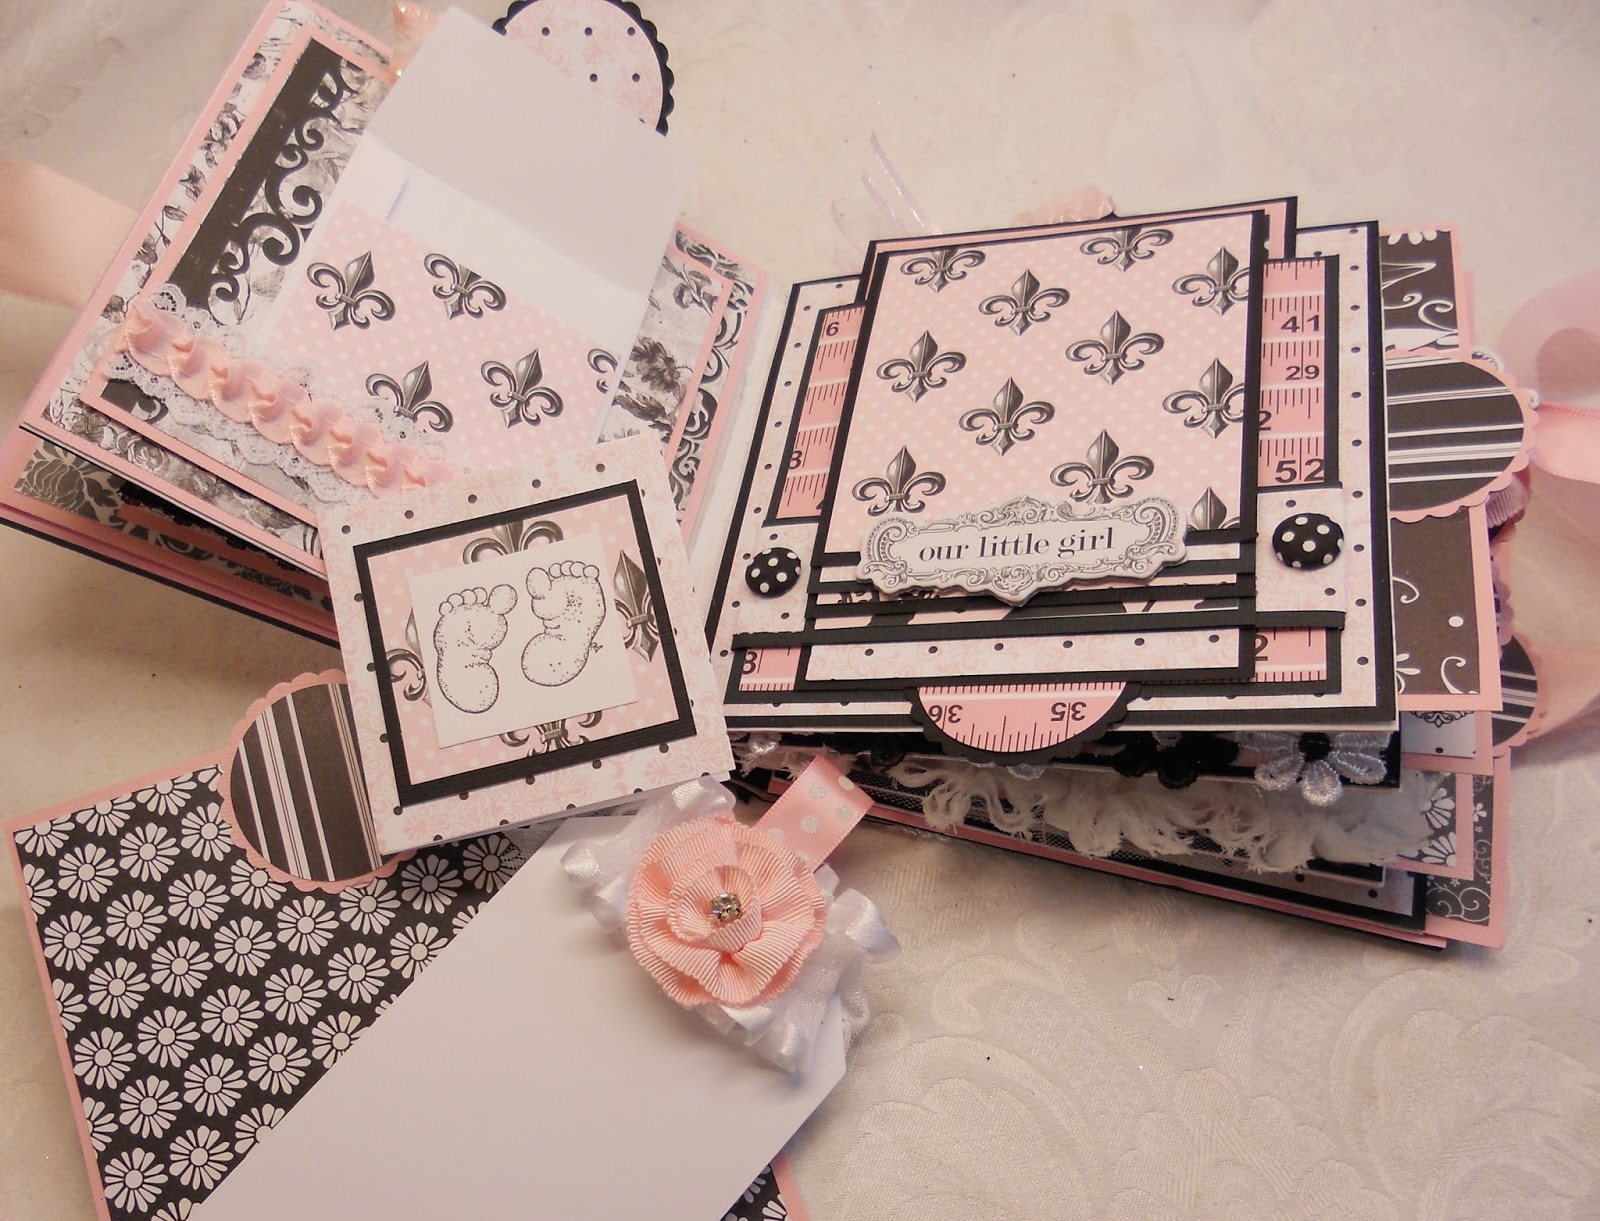 scrapbookfashionista designs by rina teresa collins bebe. Black Bedroom Furniture Sets. Home Design Ideas